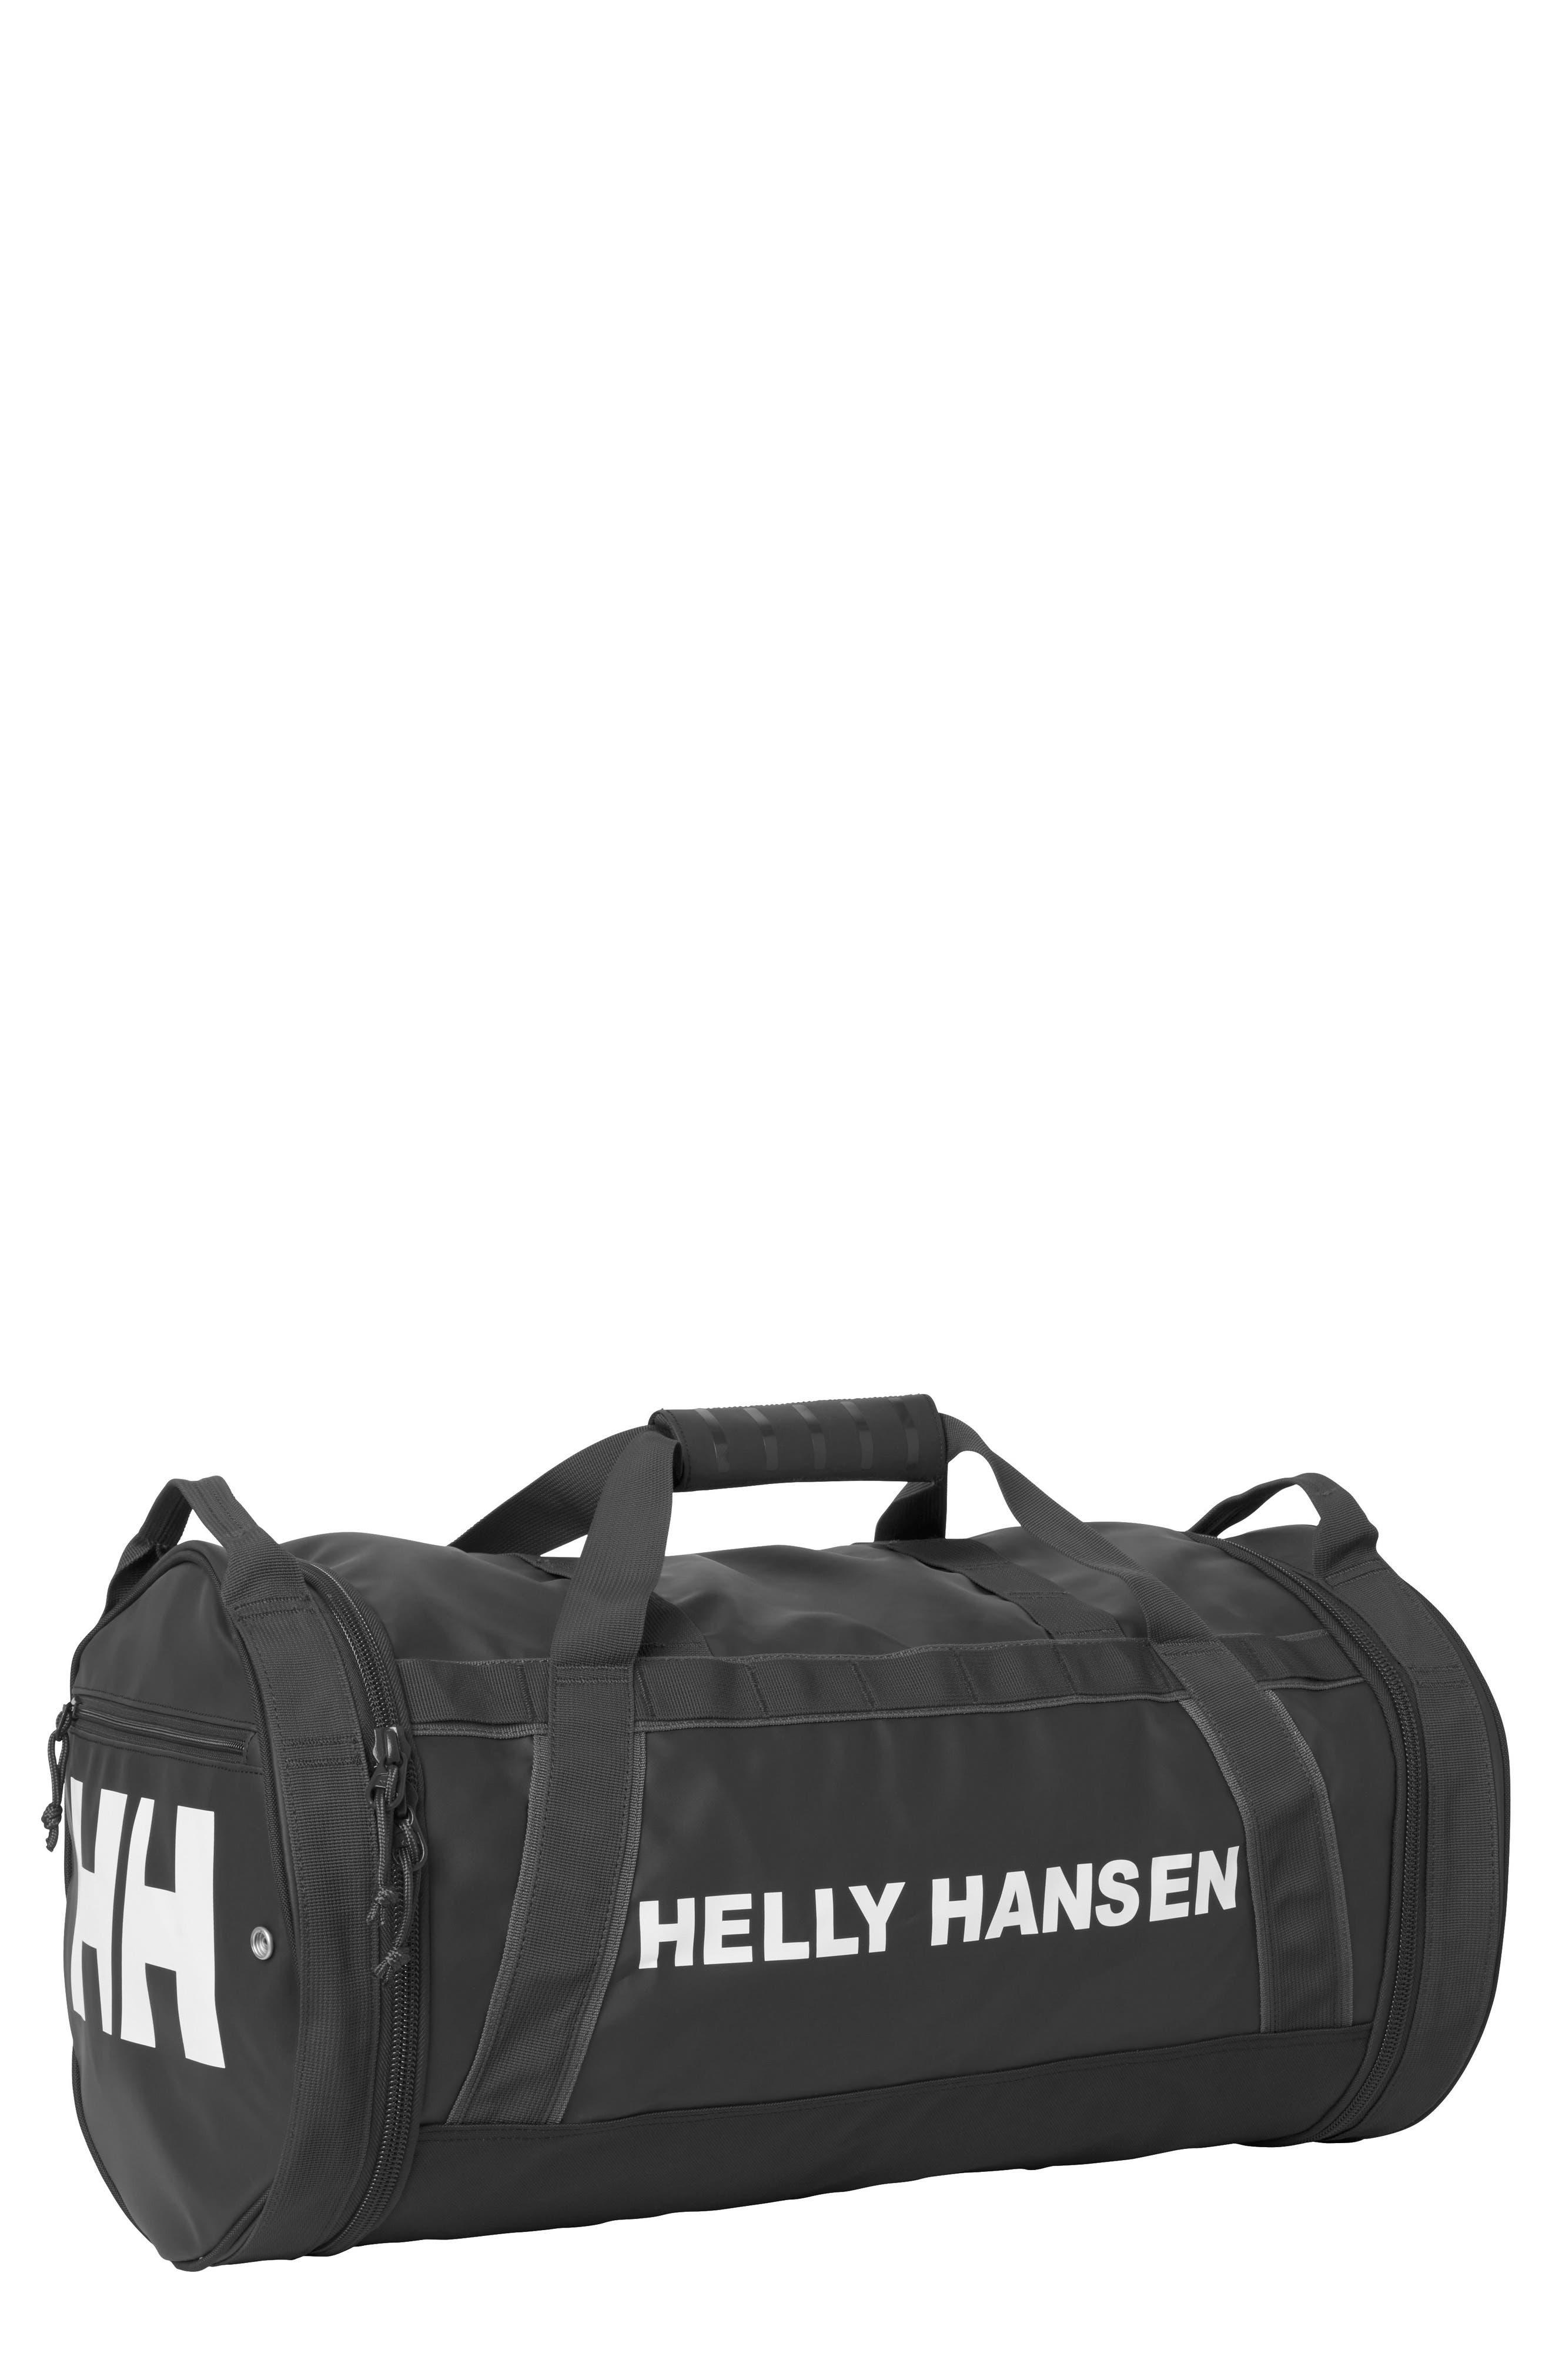 HELLY HANSEN,                             Hellypack Duffel Bag,                             Main thumbnail 1, color,                             BLACK